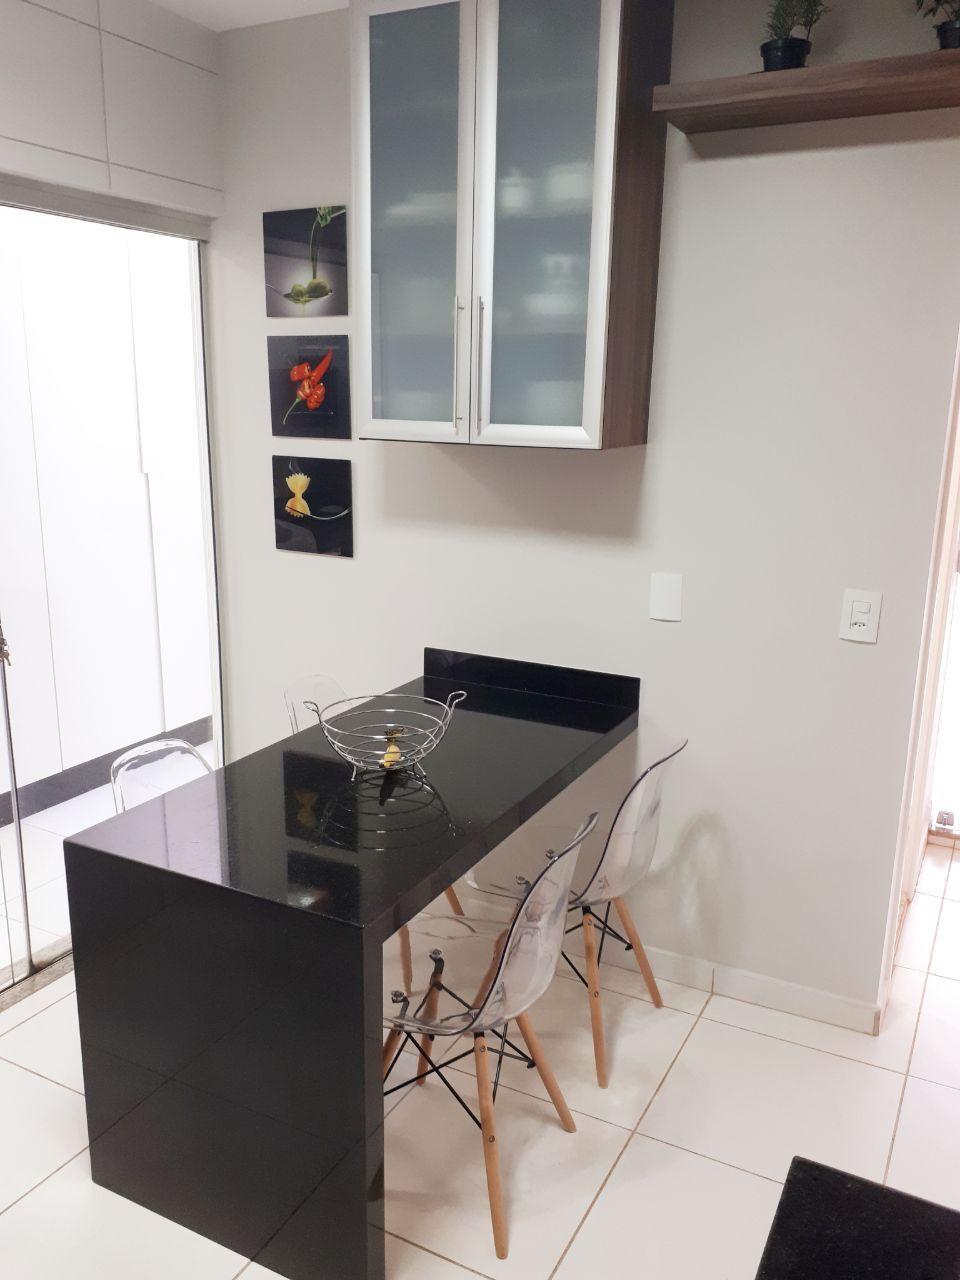 399 - Casa Cond. Parque dos Lagos 180 m²